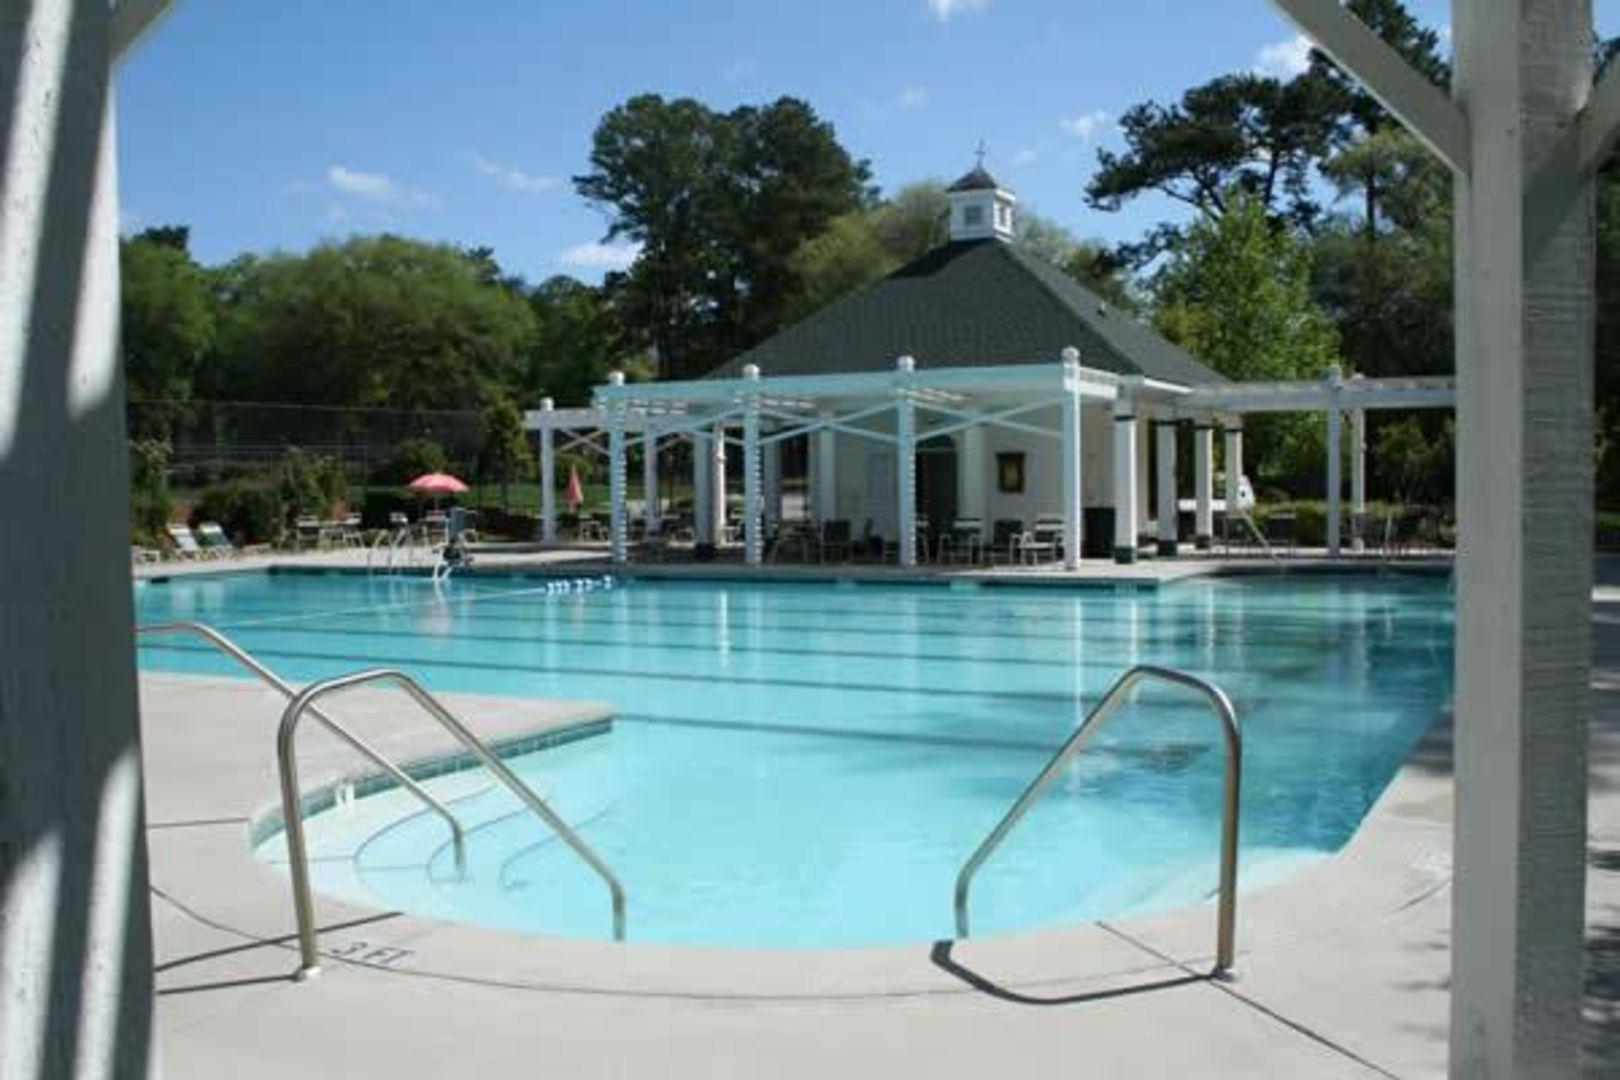 Drayton Oaks Homes For Sale - 9 Windward, Summerville, SC - 0